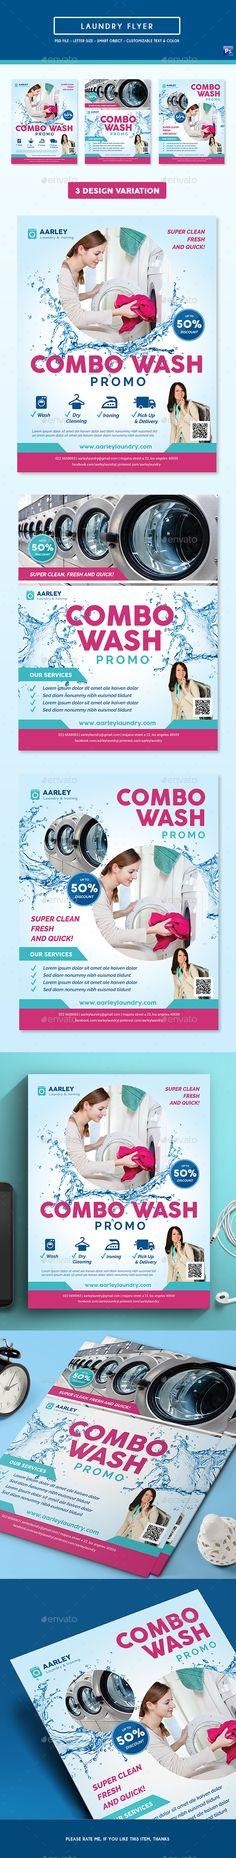 Laundry Flyer Template PSD. Download here: https://graphicriver.net/item/laundry-flyer/17532921?ref=ksioks